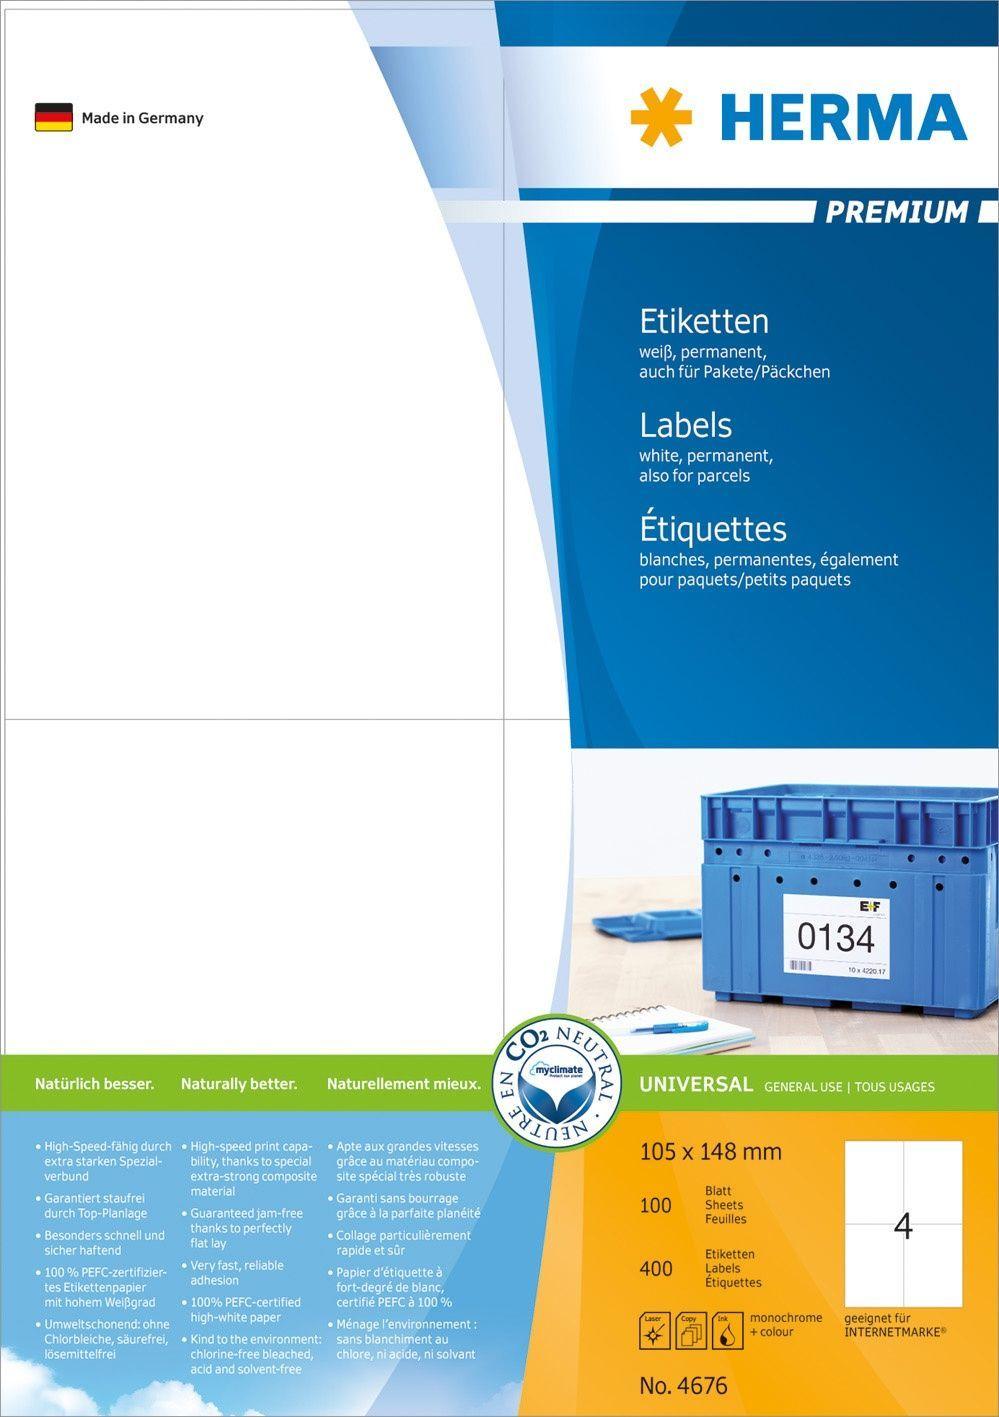 Herma Etikett premium A4 105x148mm (400) Y450067